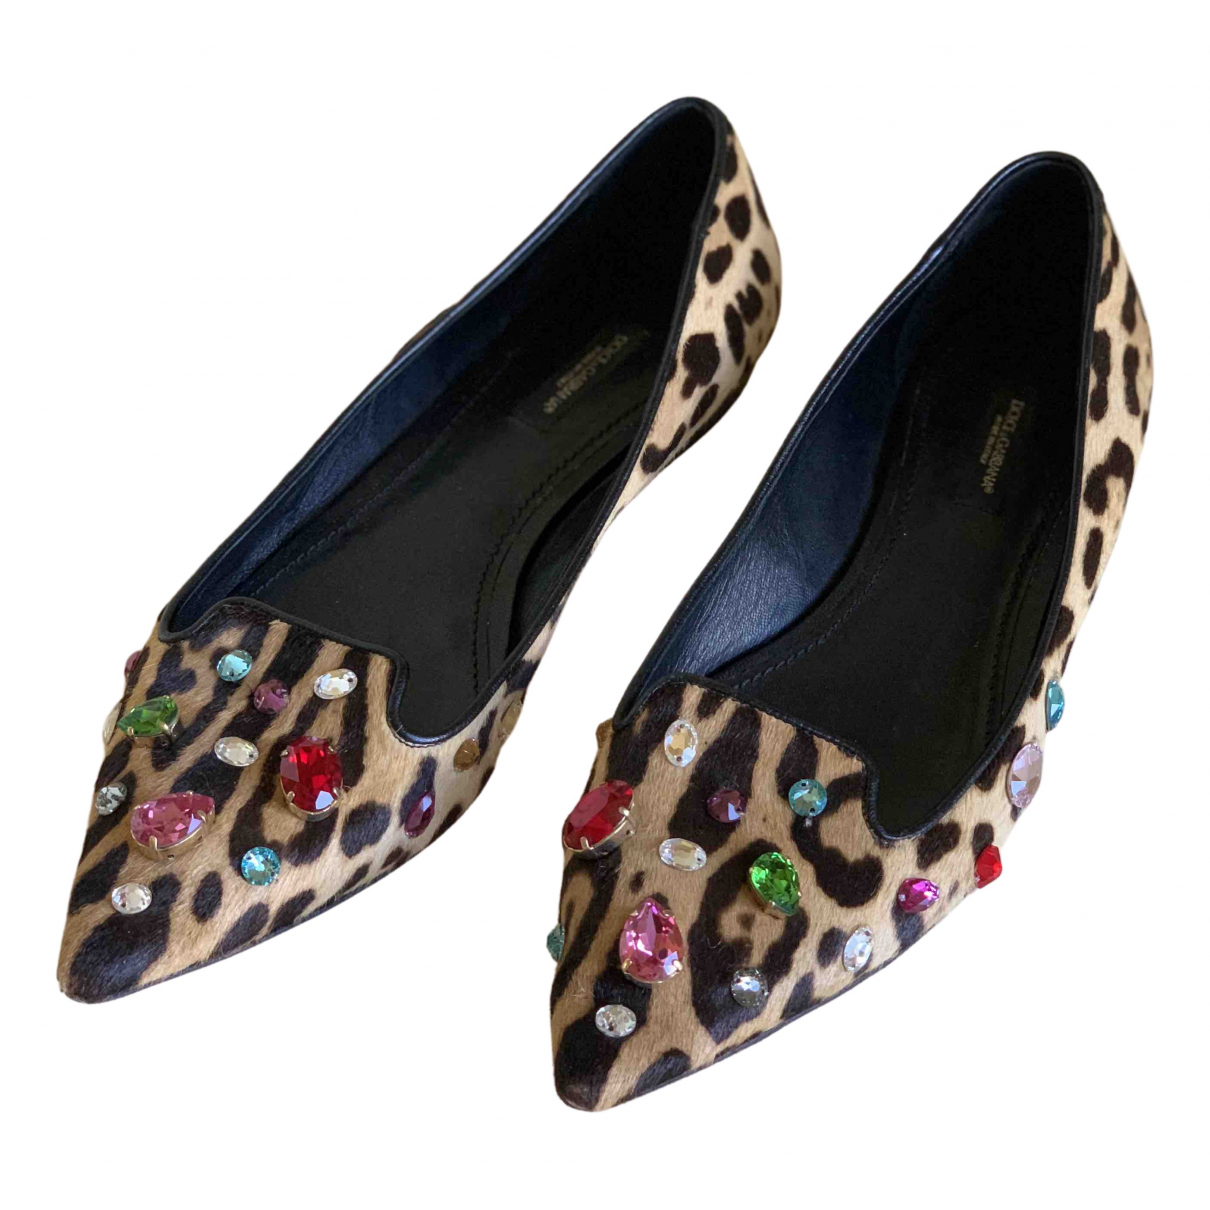 Dolce & Gabbana \N Ballerinas in Kalbsleder in Pony-Optik